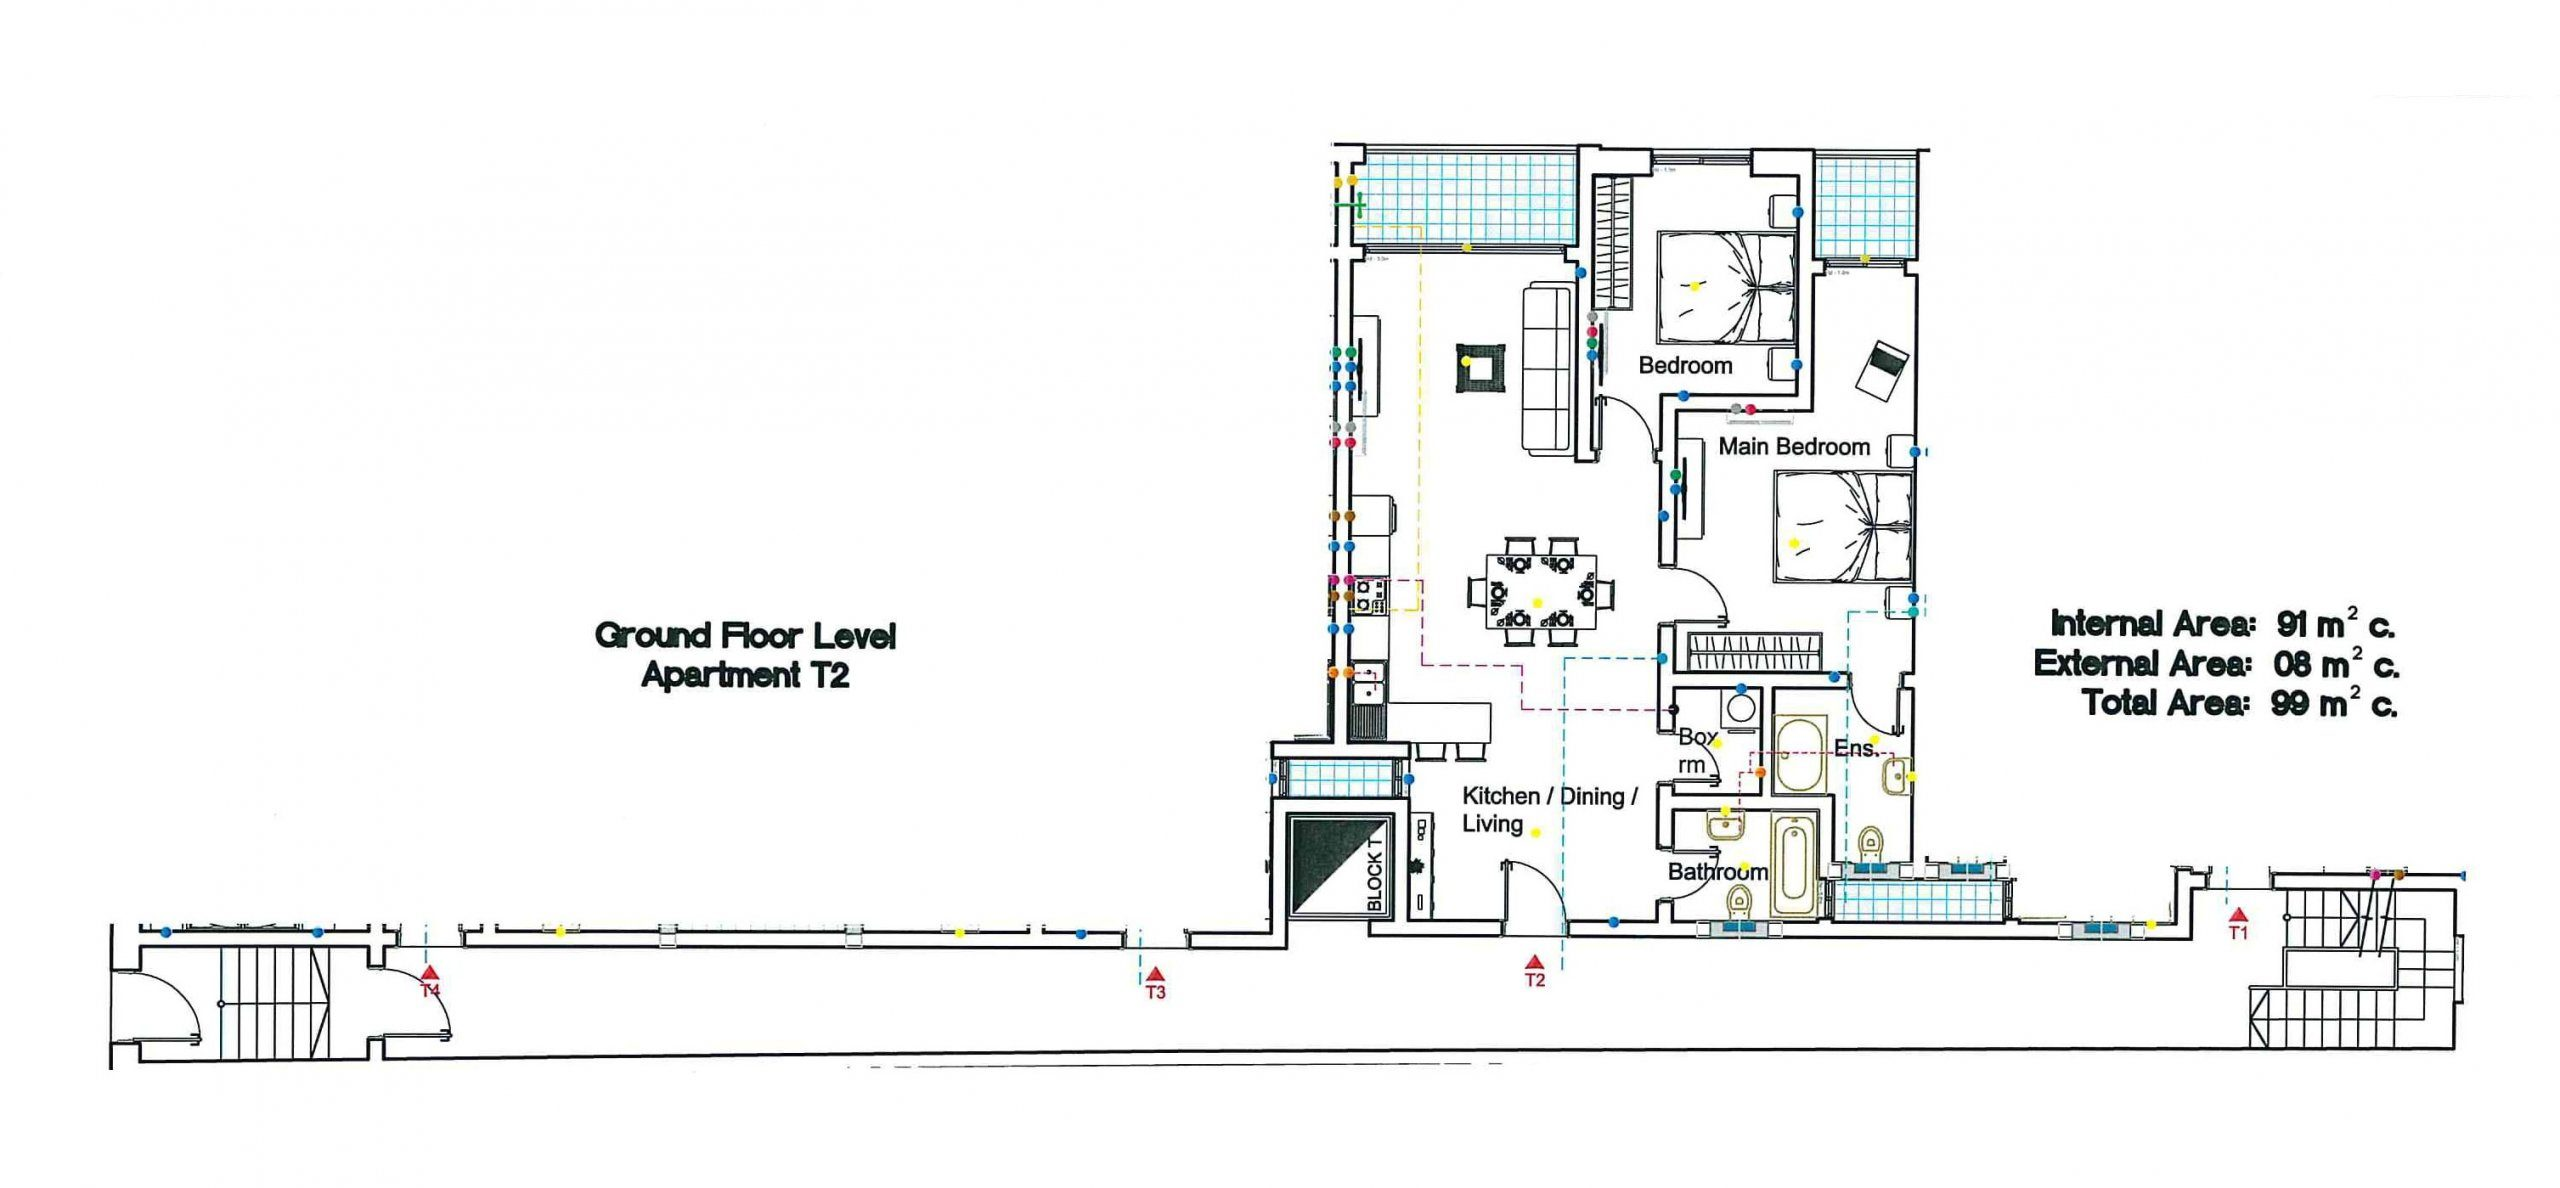 T2 Ground Floor